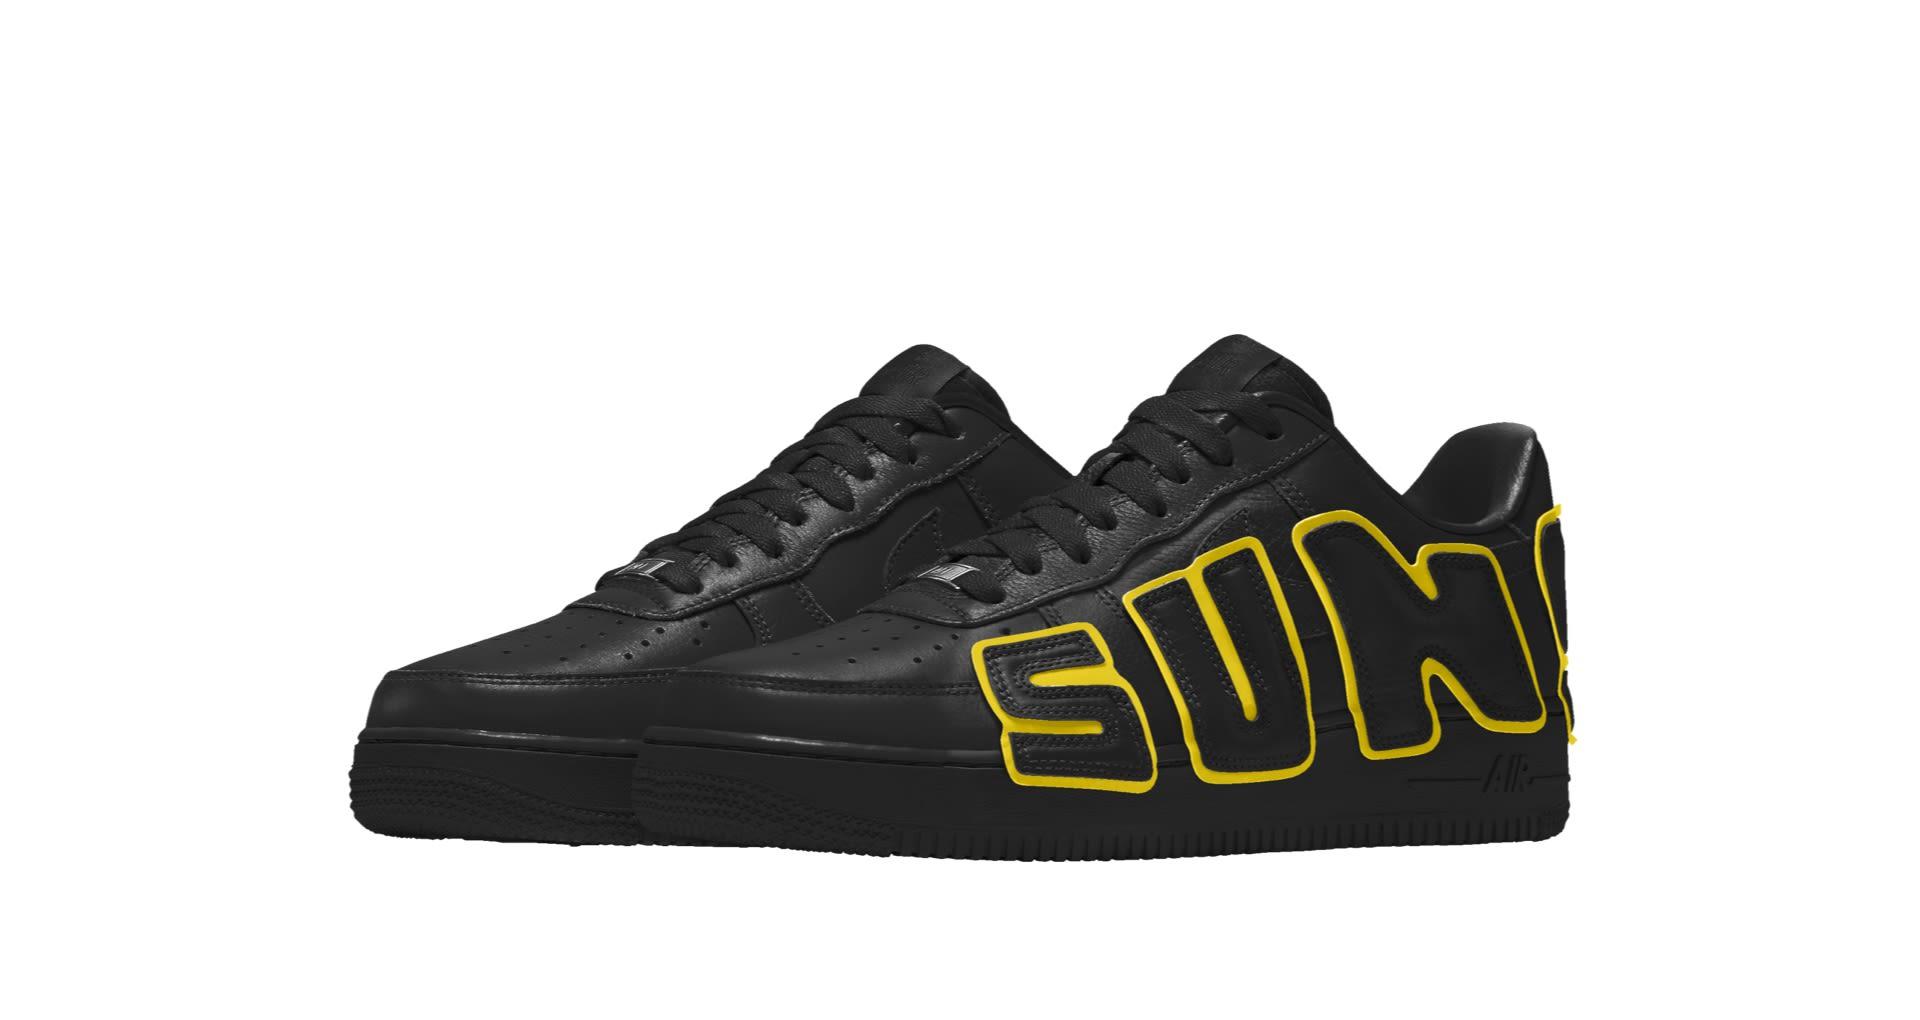 sciarpa Fa i lavori domestici Pancia  CPFM x Nike Air Force 1 By You 'Custom Shoe' - BUZZSNKR